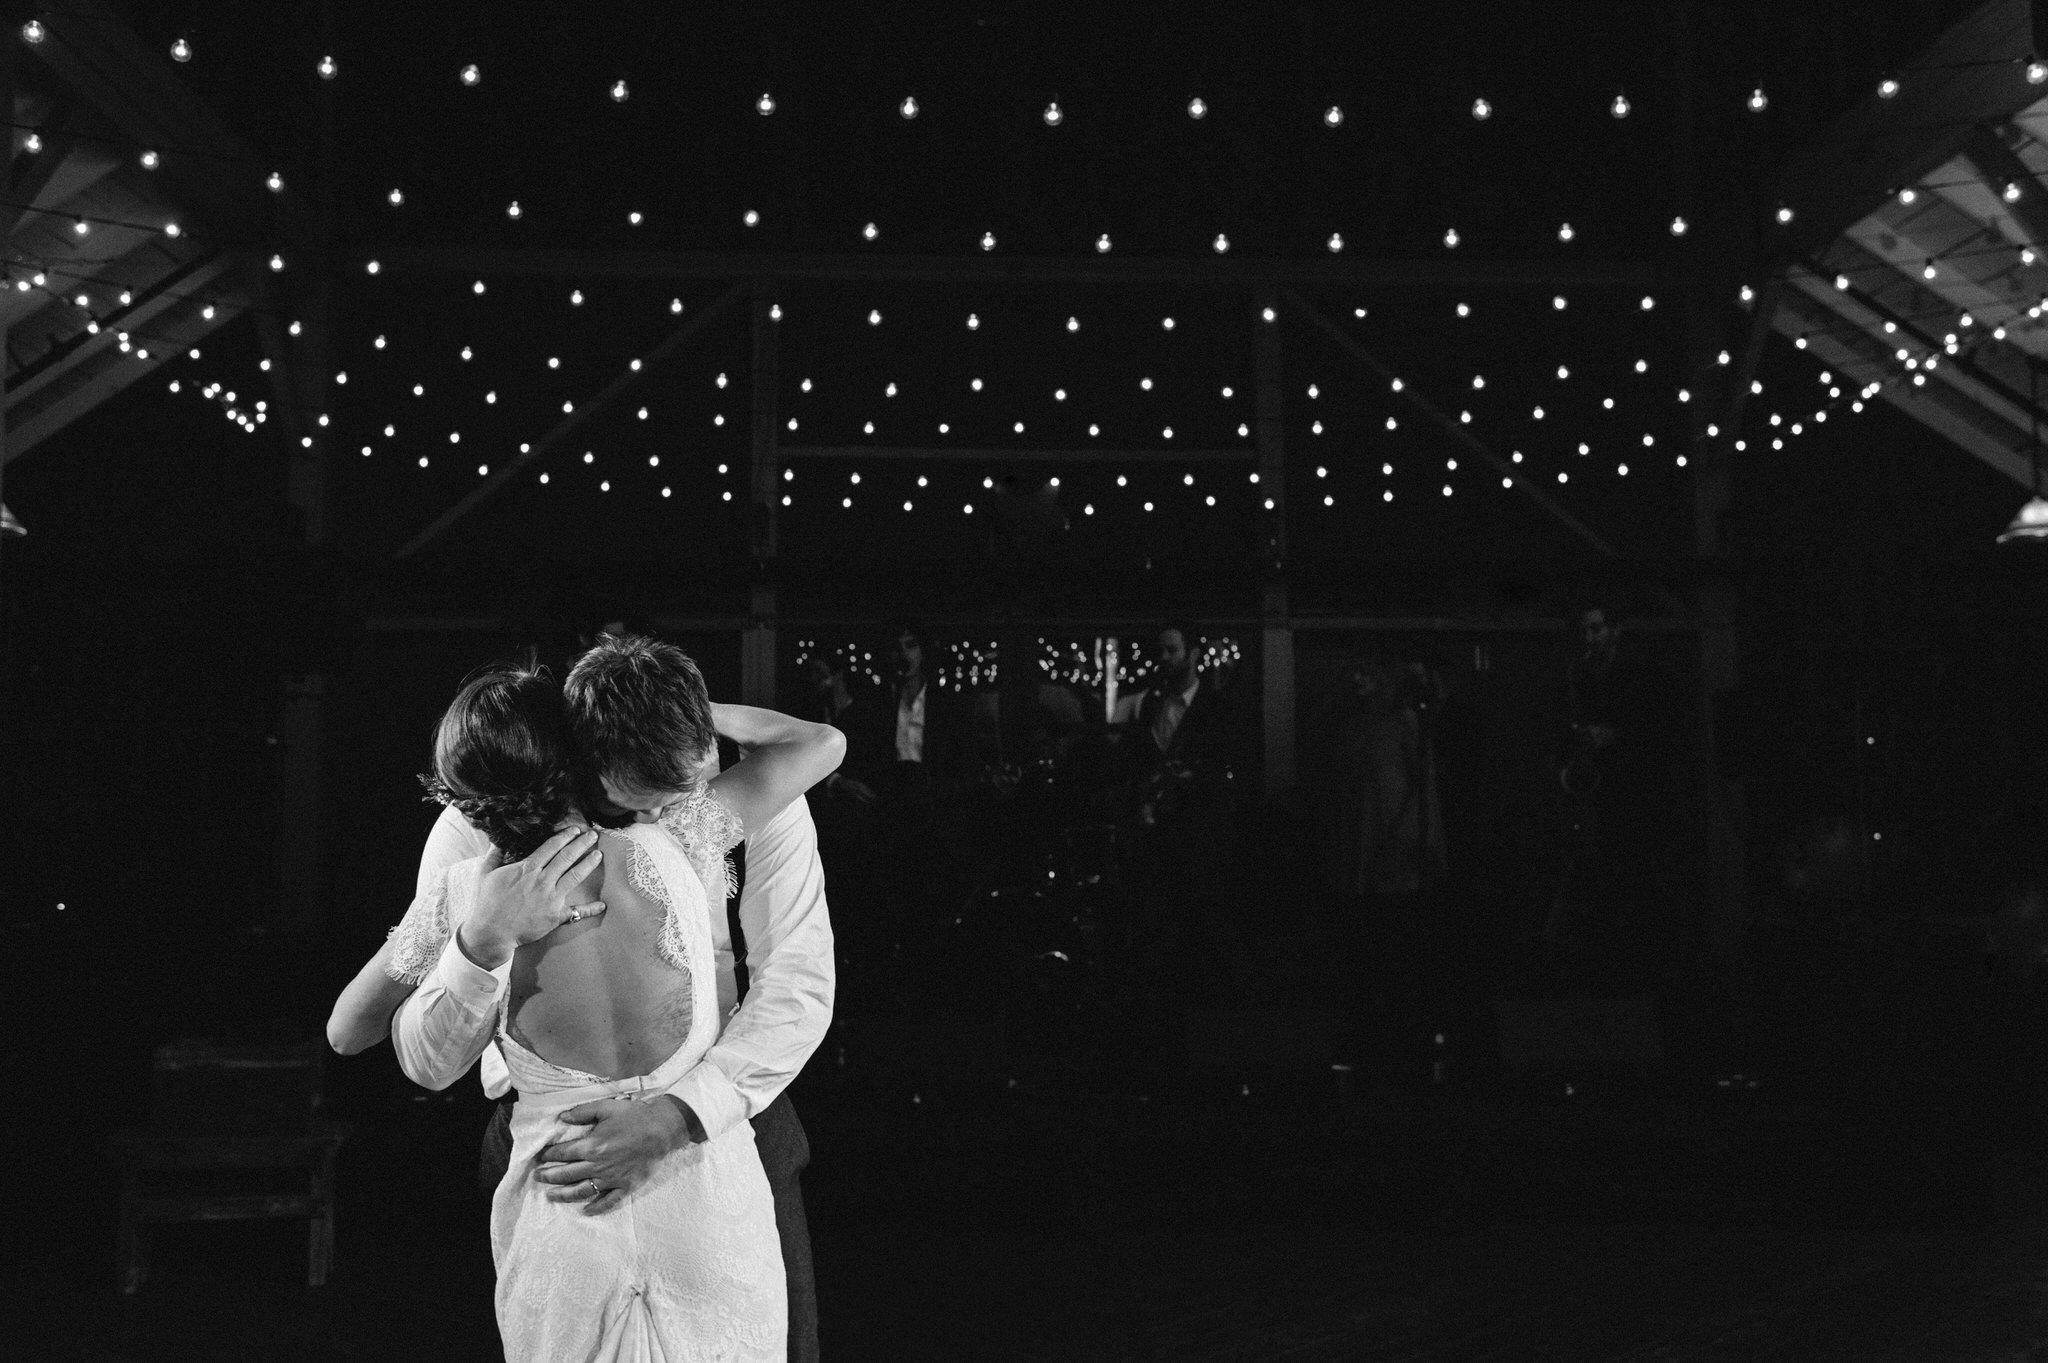 scarletoneillphotography_weddingphotography_prince edward county weddings172.JPG